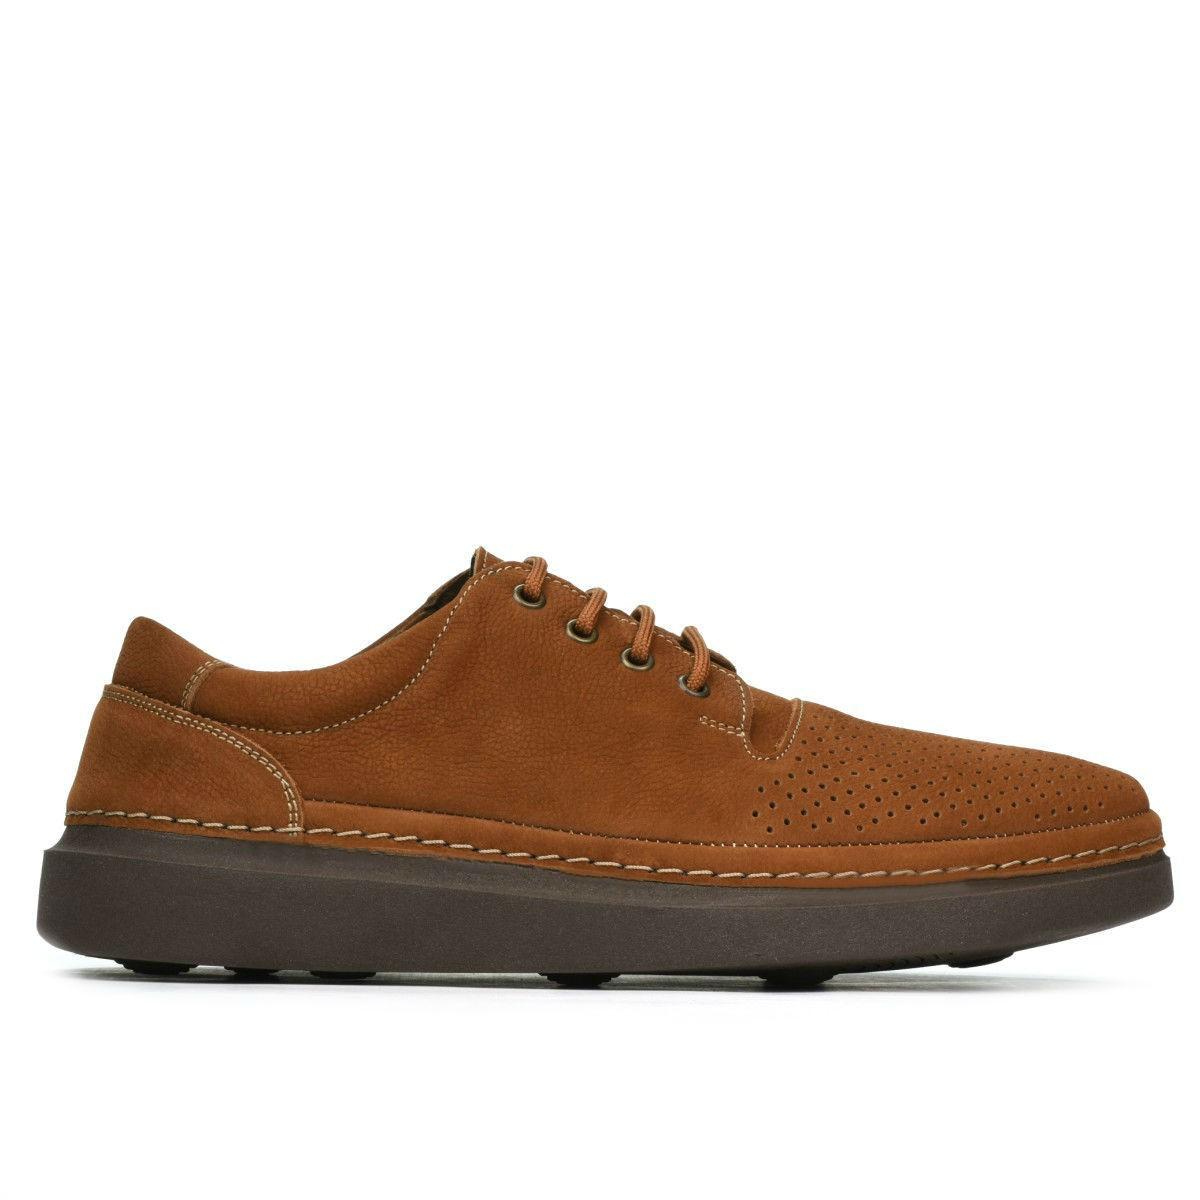 disponibilitate Marea Britanie destul de frumos ieftin Pantofi casual/sport barbati 901 bufo brown. Natural leather. - Marelbo